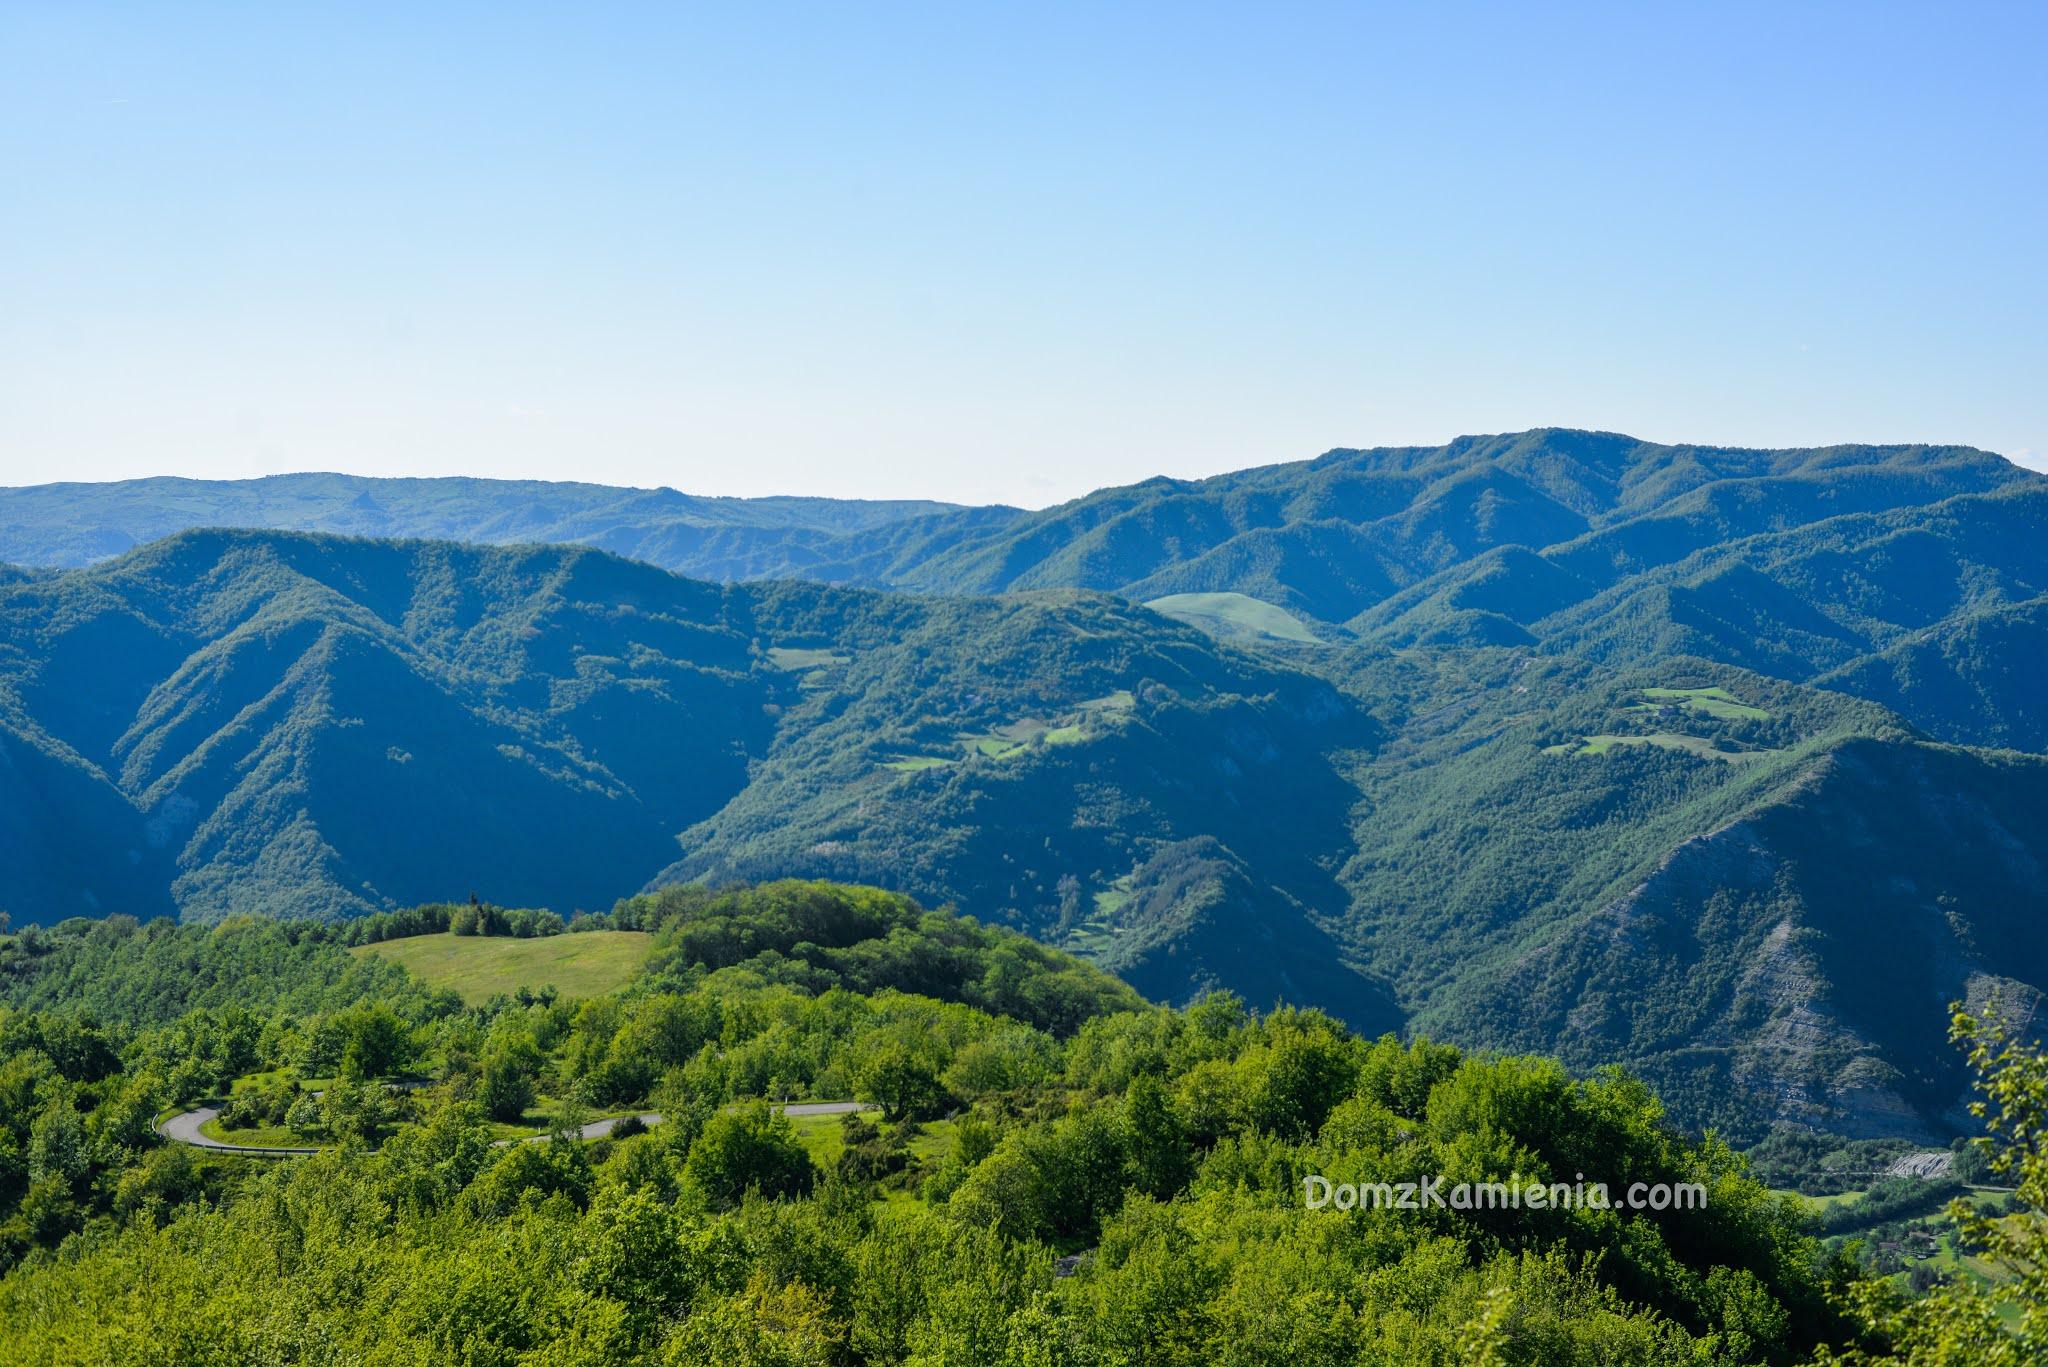 Alto Mugello - Dom z Kamienia blog o życiu we Włoszech